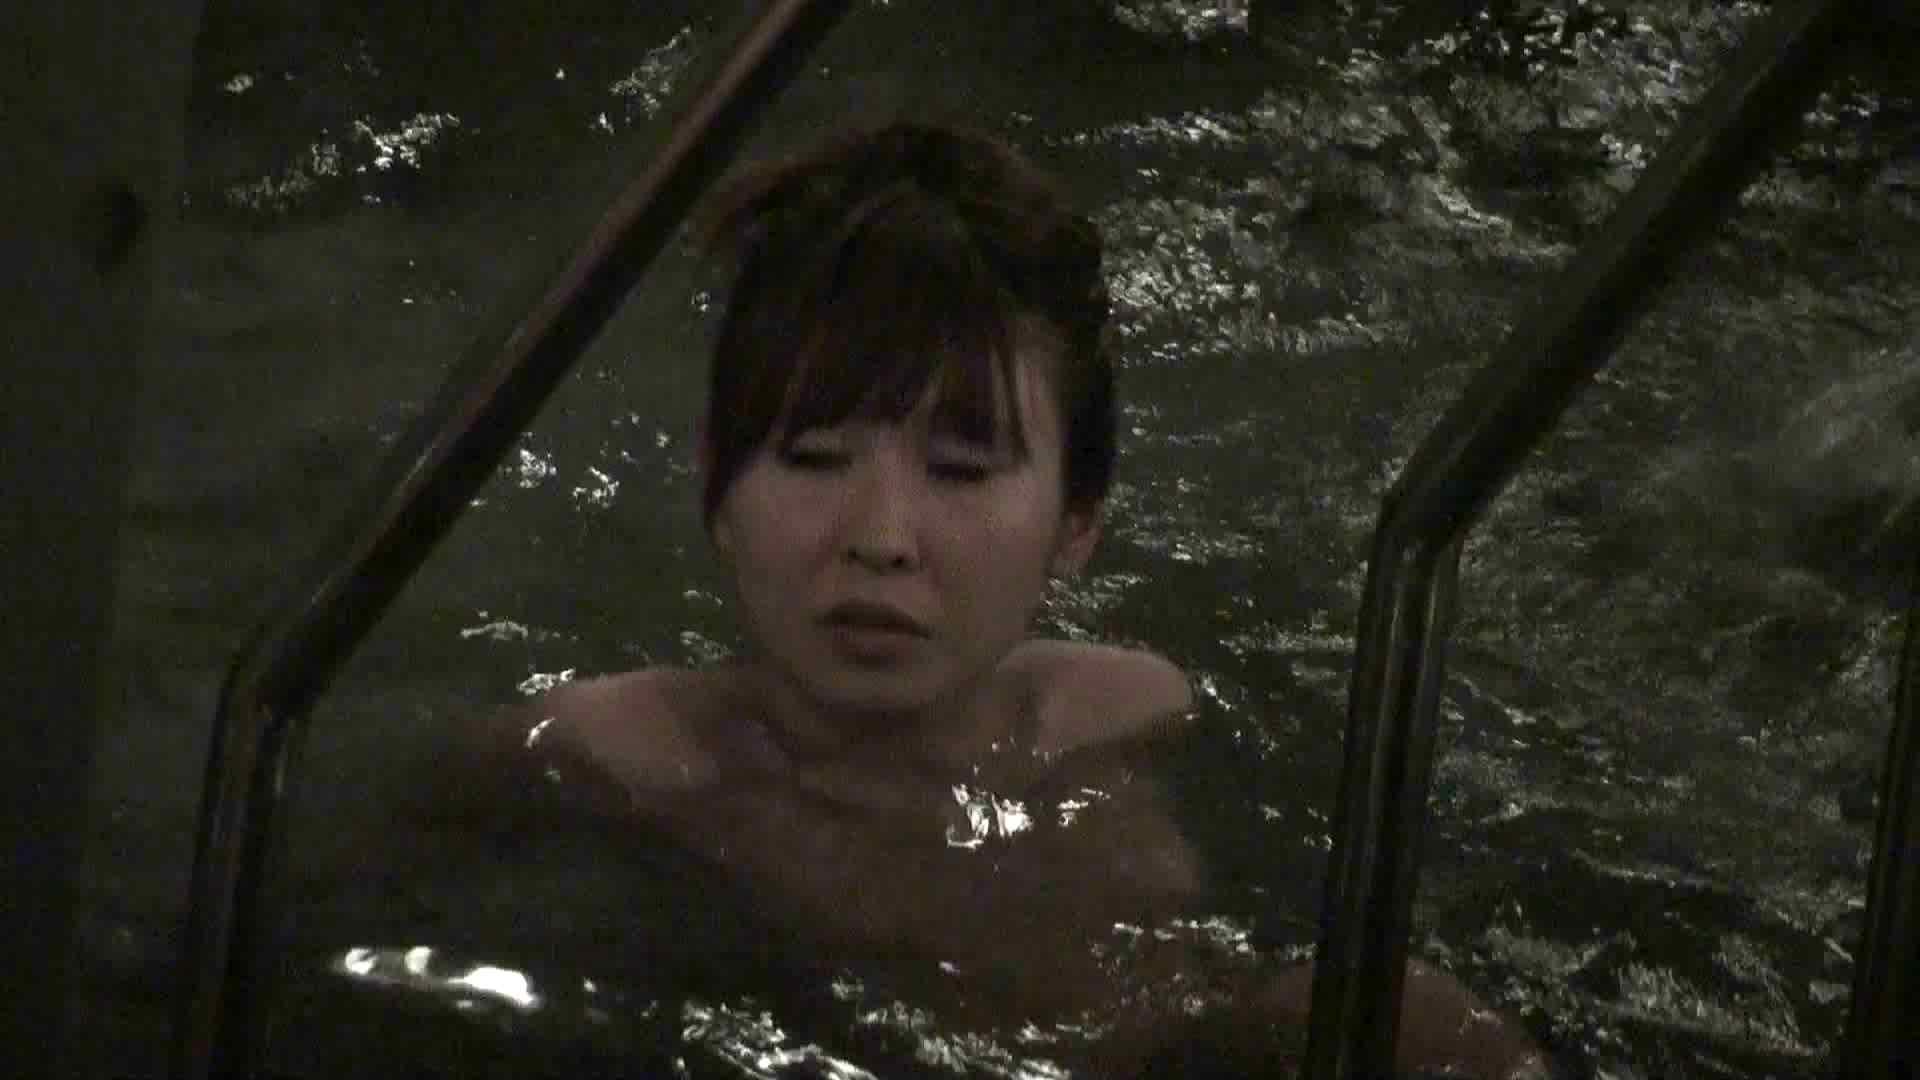 Aquaな露天風呂Vol.410 盗撮  73連発 50